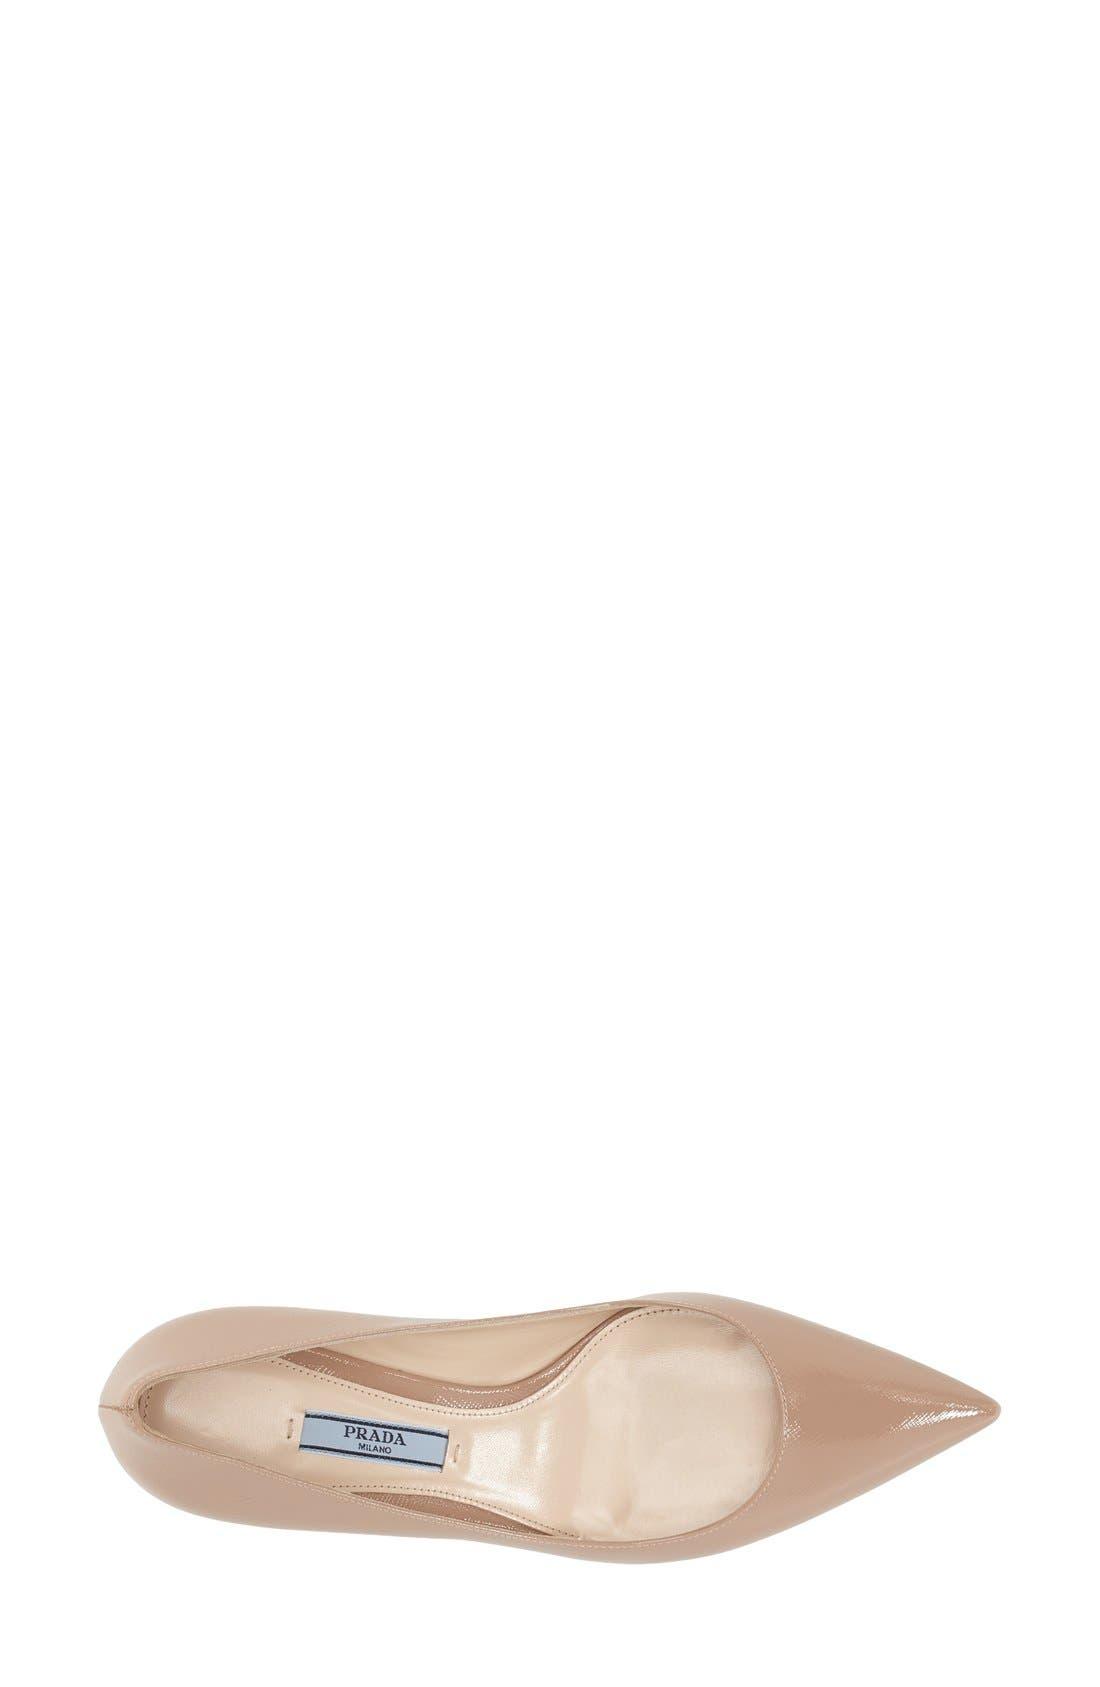 Alternate Image 3  - Prada Pointy Toe Pump (Women)